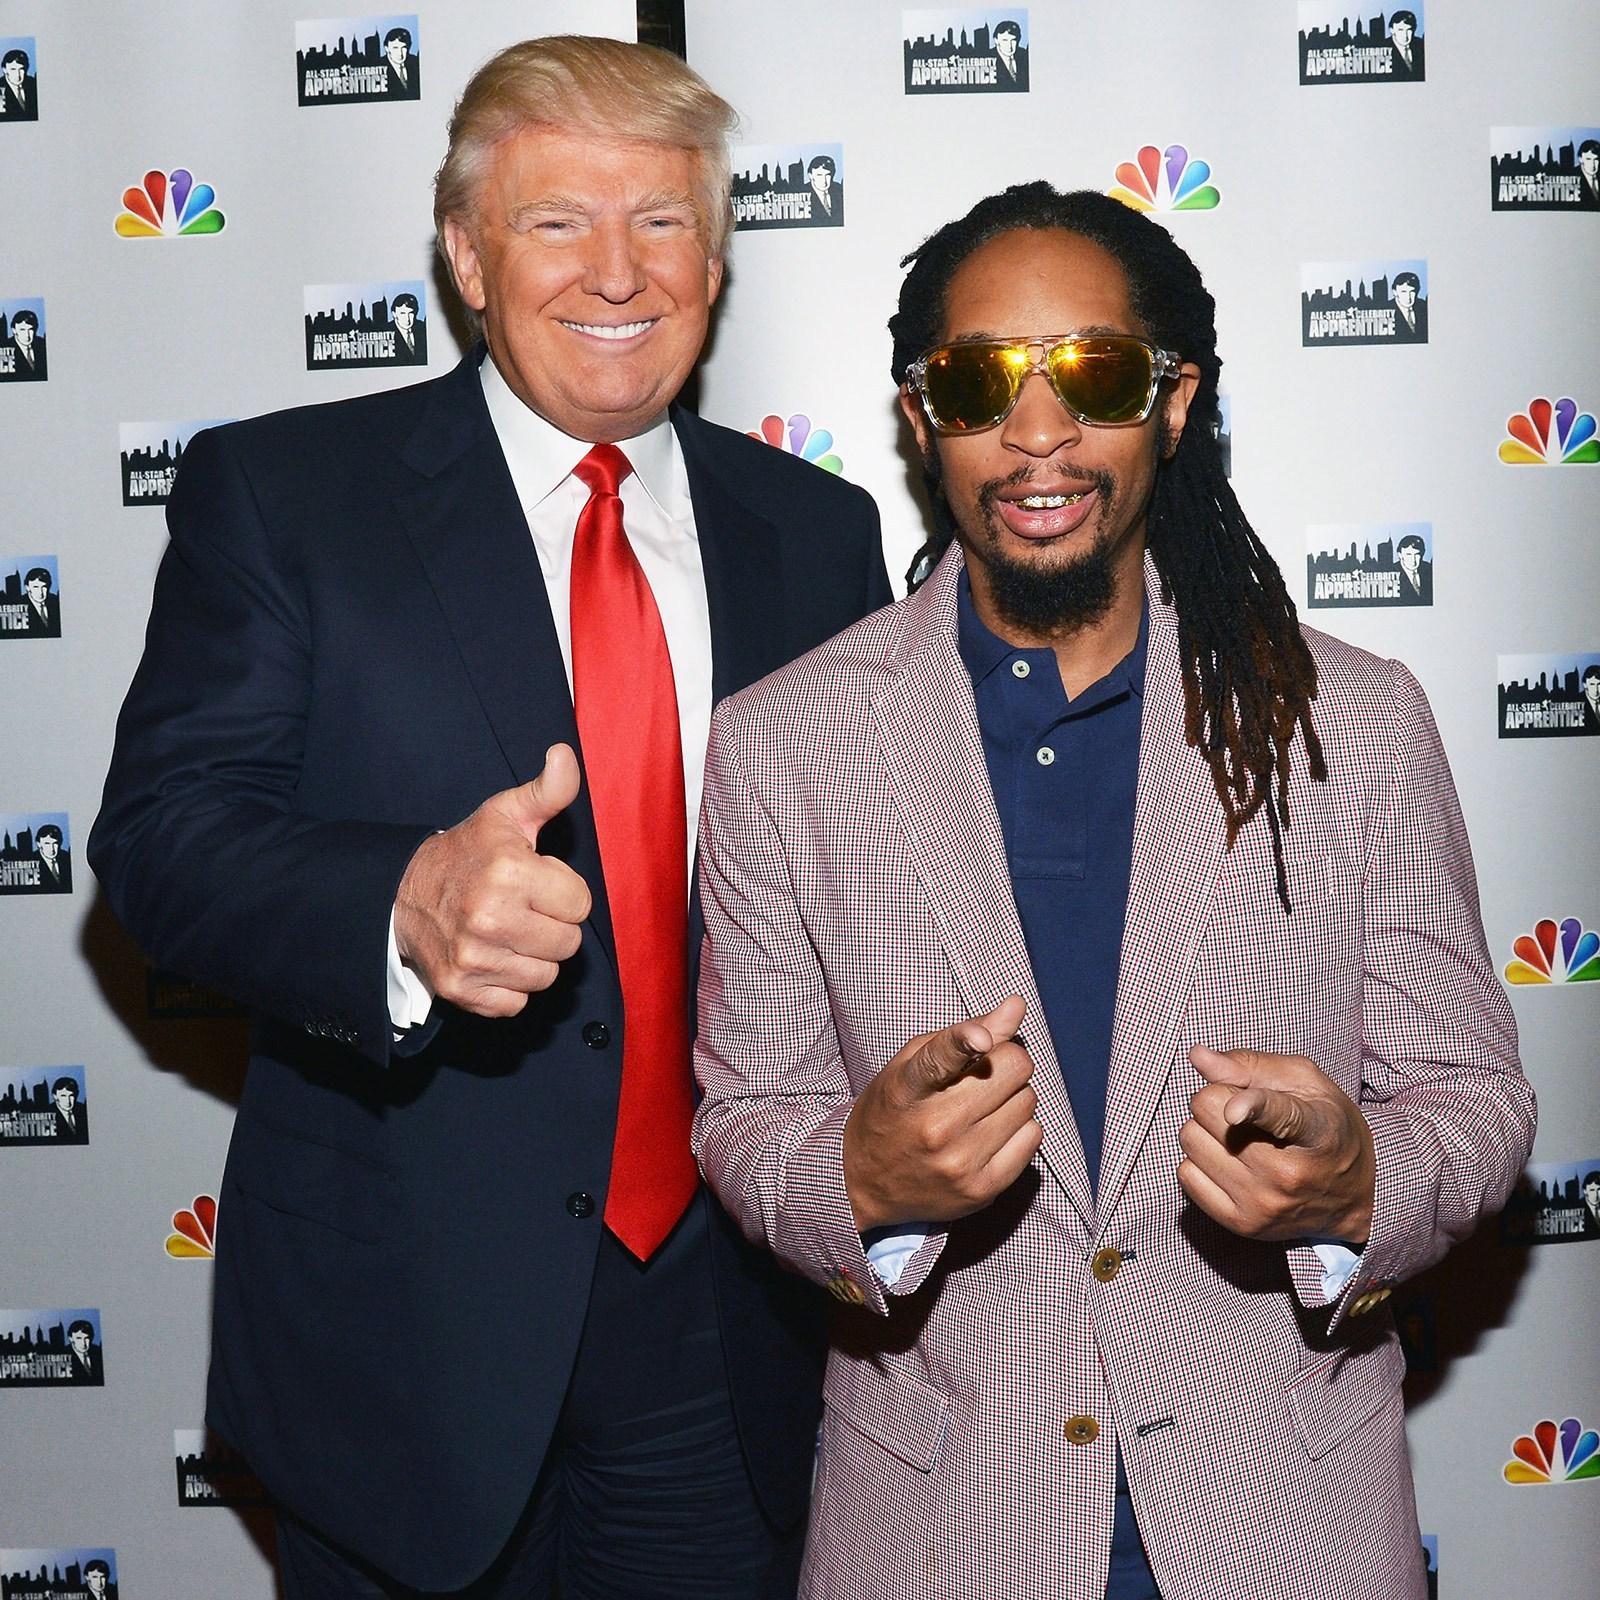 Donald Trump and Lil Jon